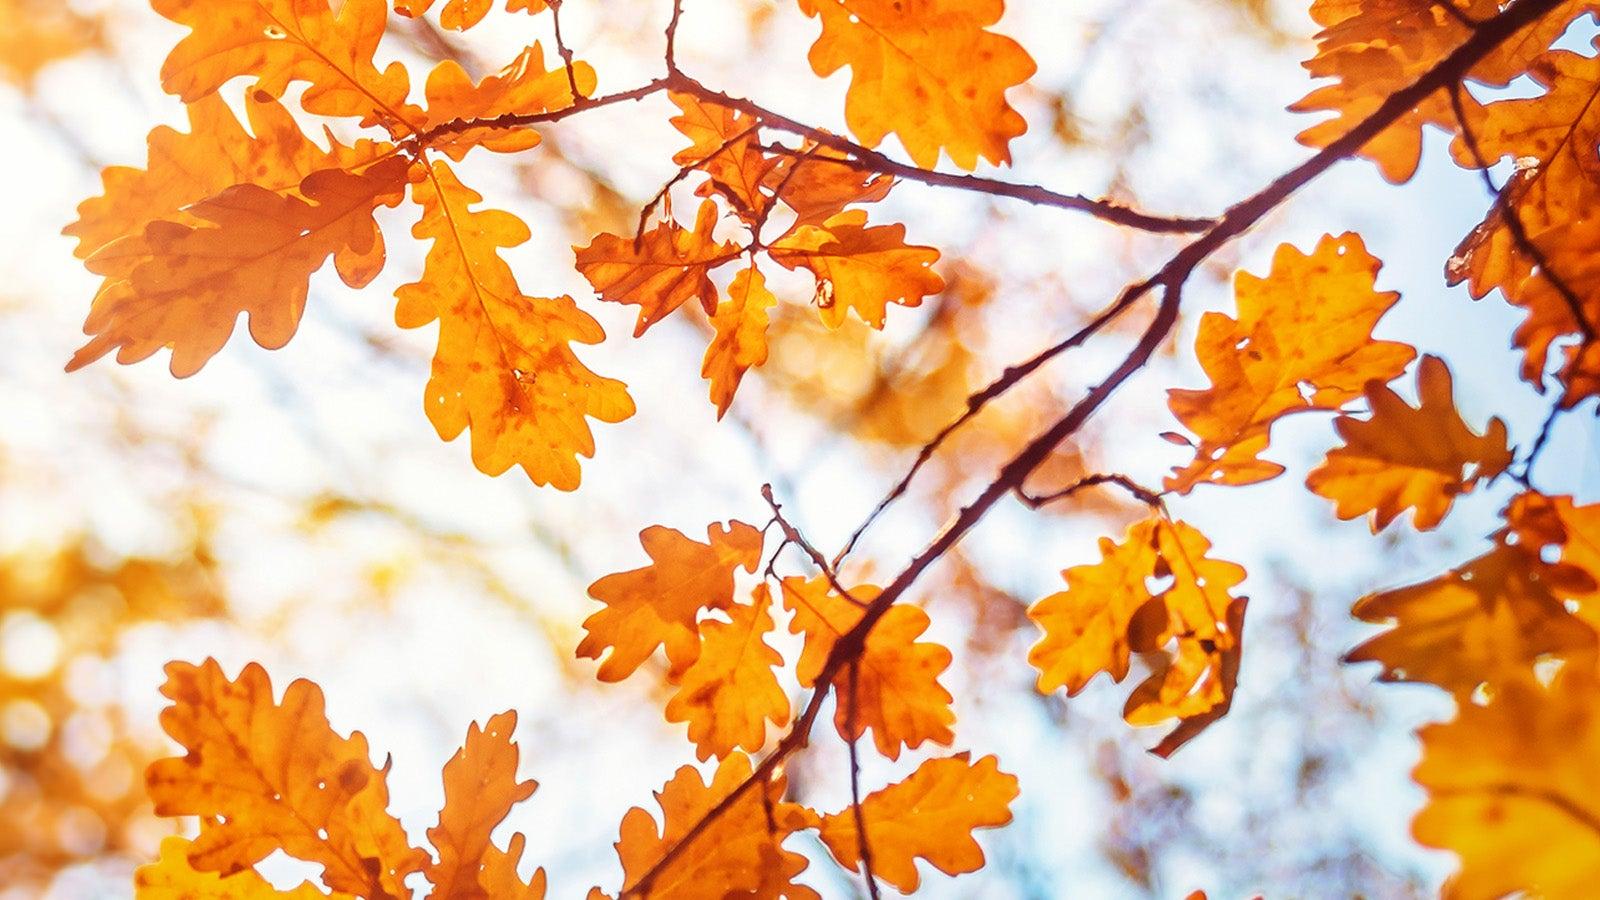 Brown oak leaves in Autumn